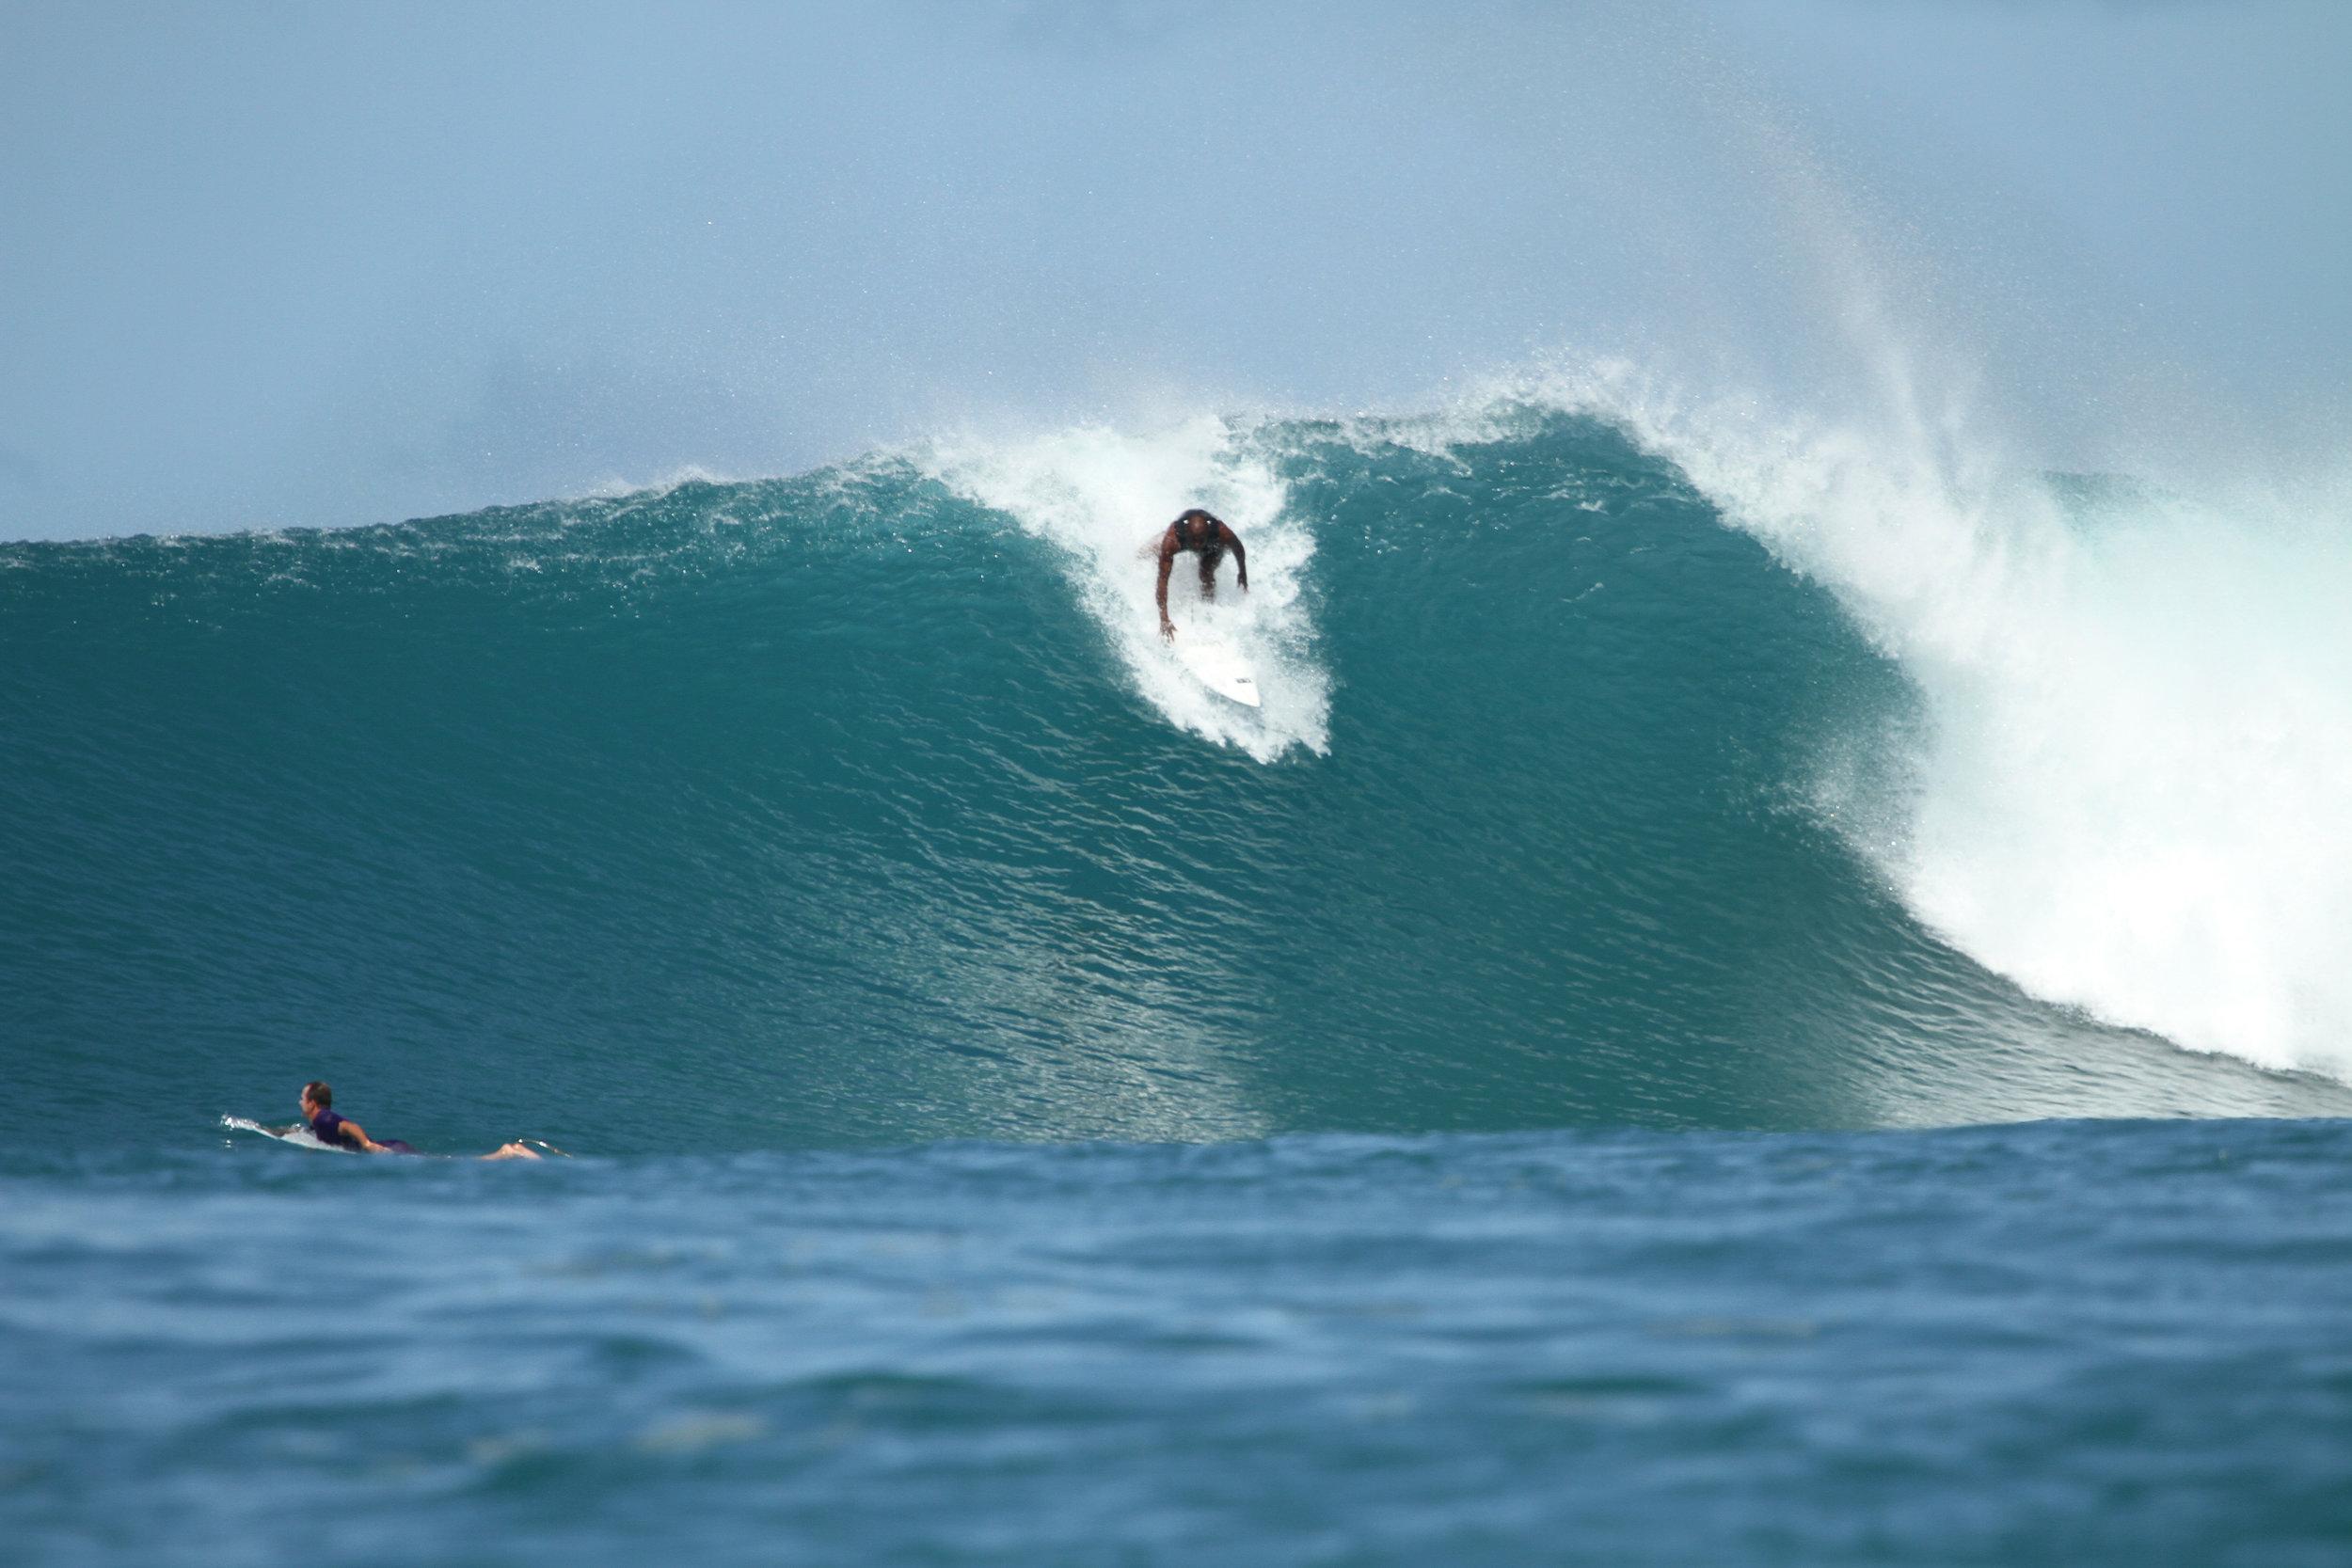 Gary surfs the Bank Vault in Mentawai, Indonesia. Photo credit St. John Visual